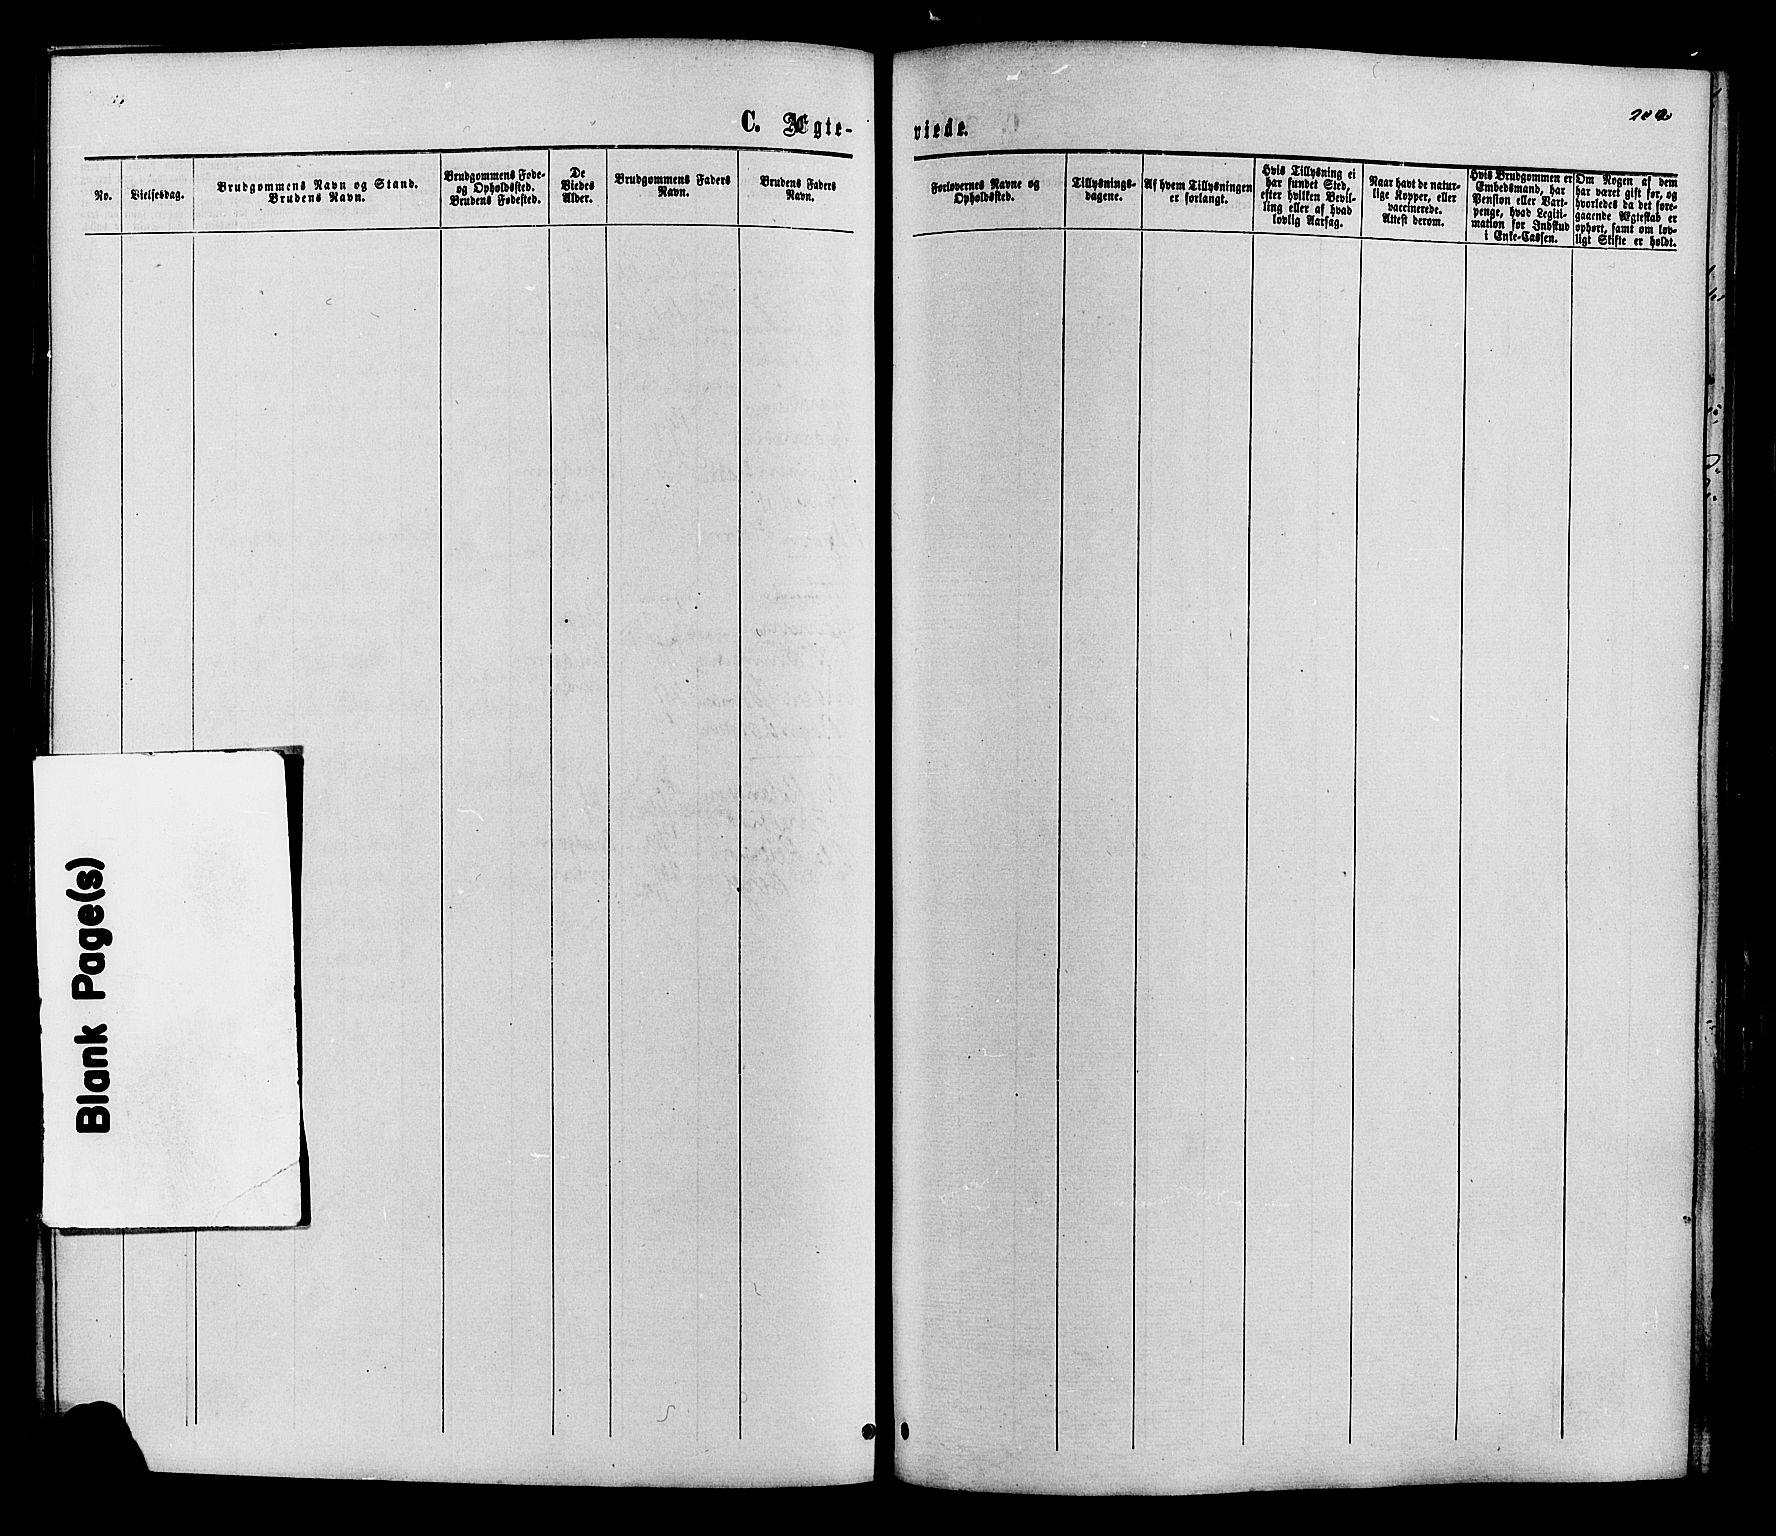 SAH, Vestre Slidre prestekontor, Ministerialbok nr. 3, 1865-1880, s. 202